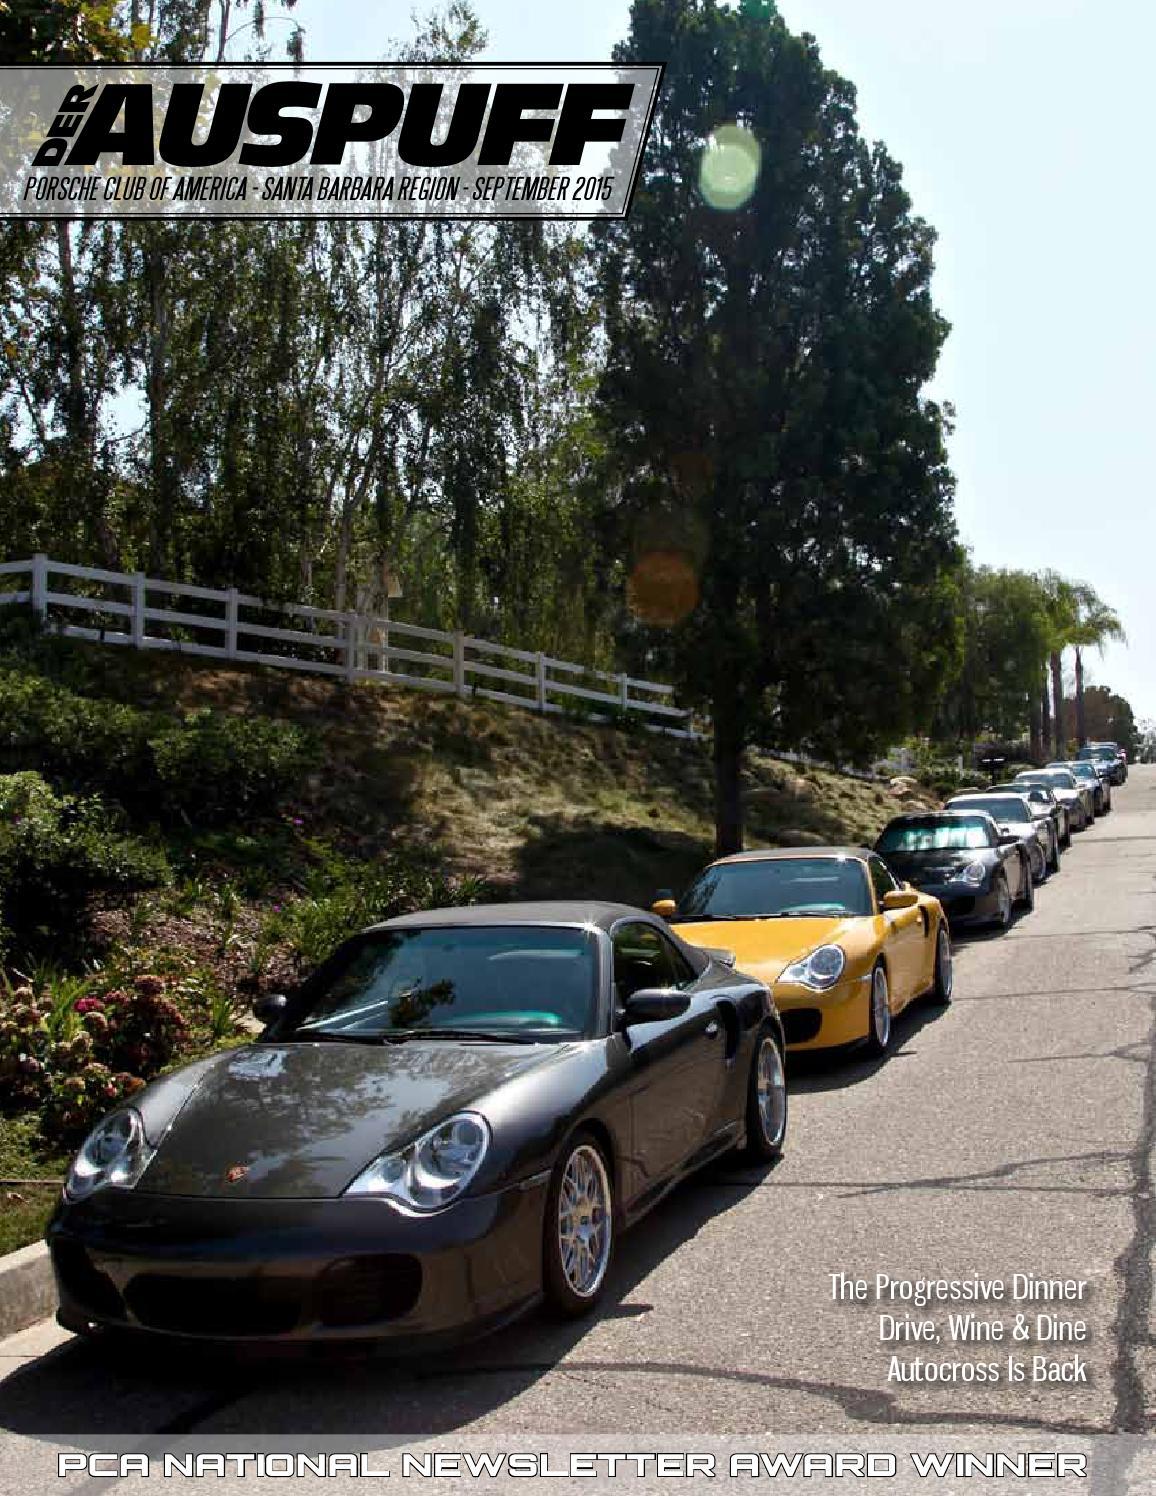 Hendry S Beach Santa Barbara Best On The World 2017